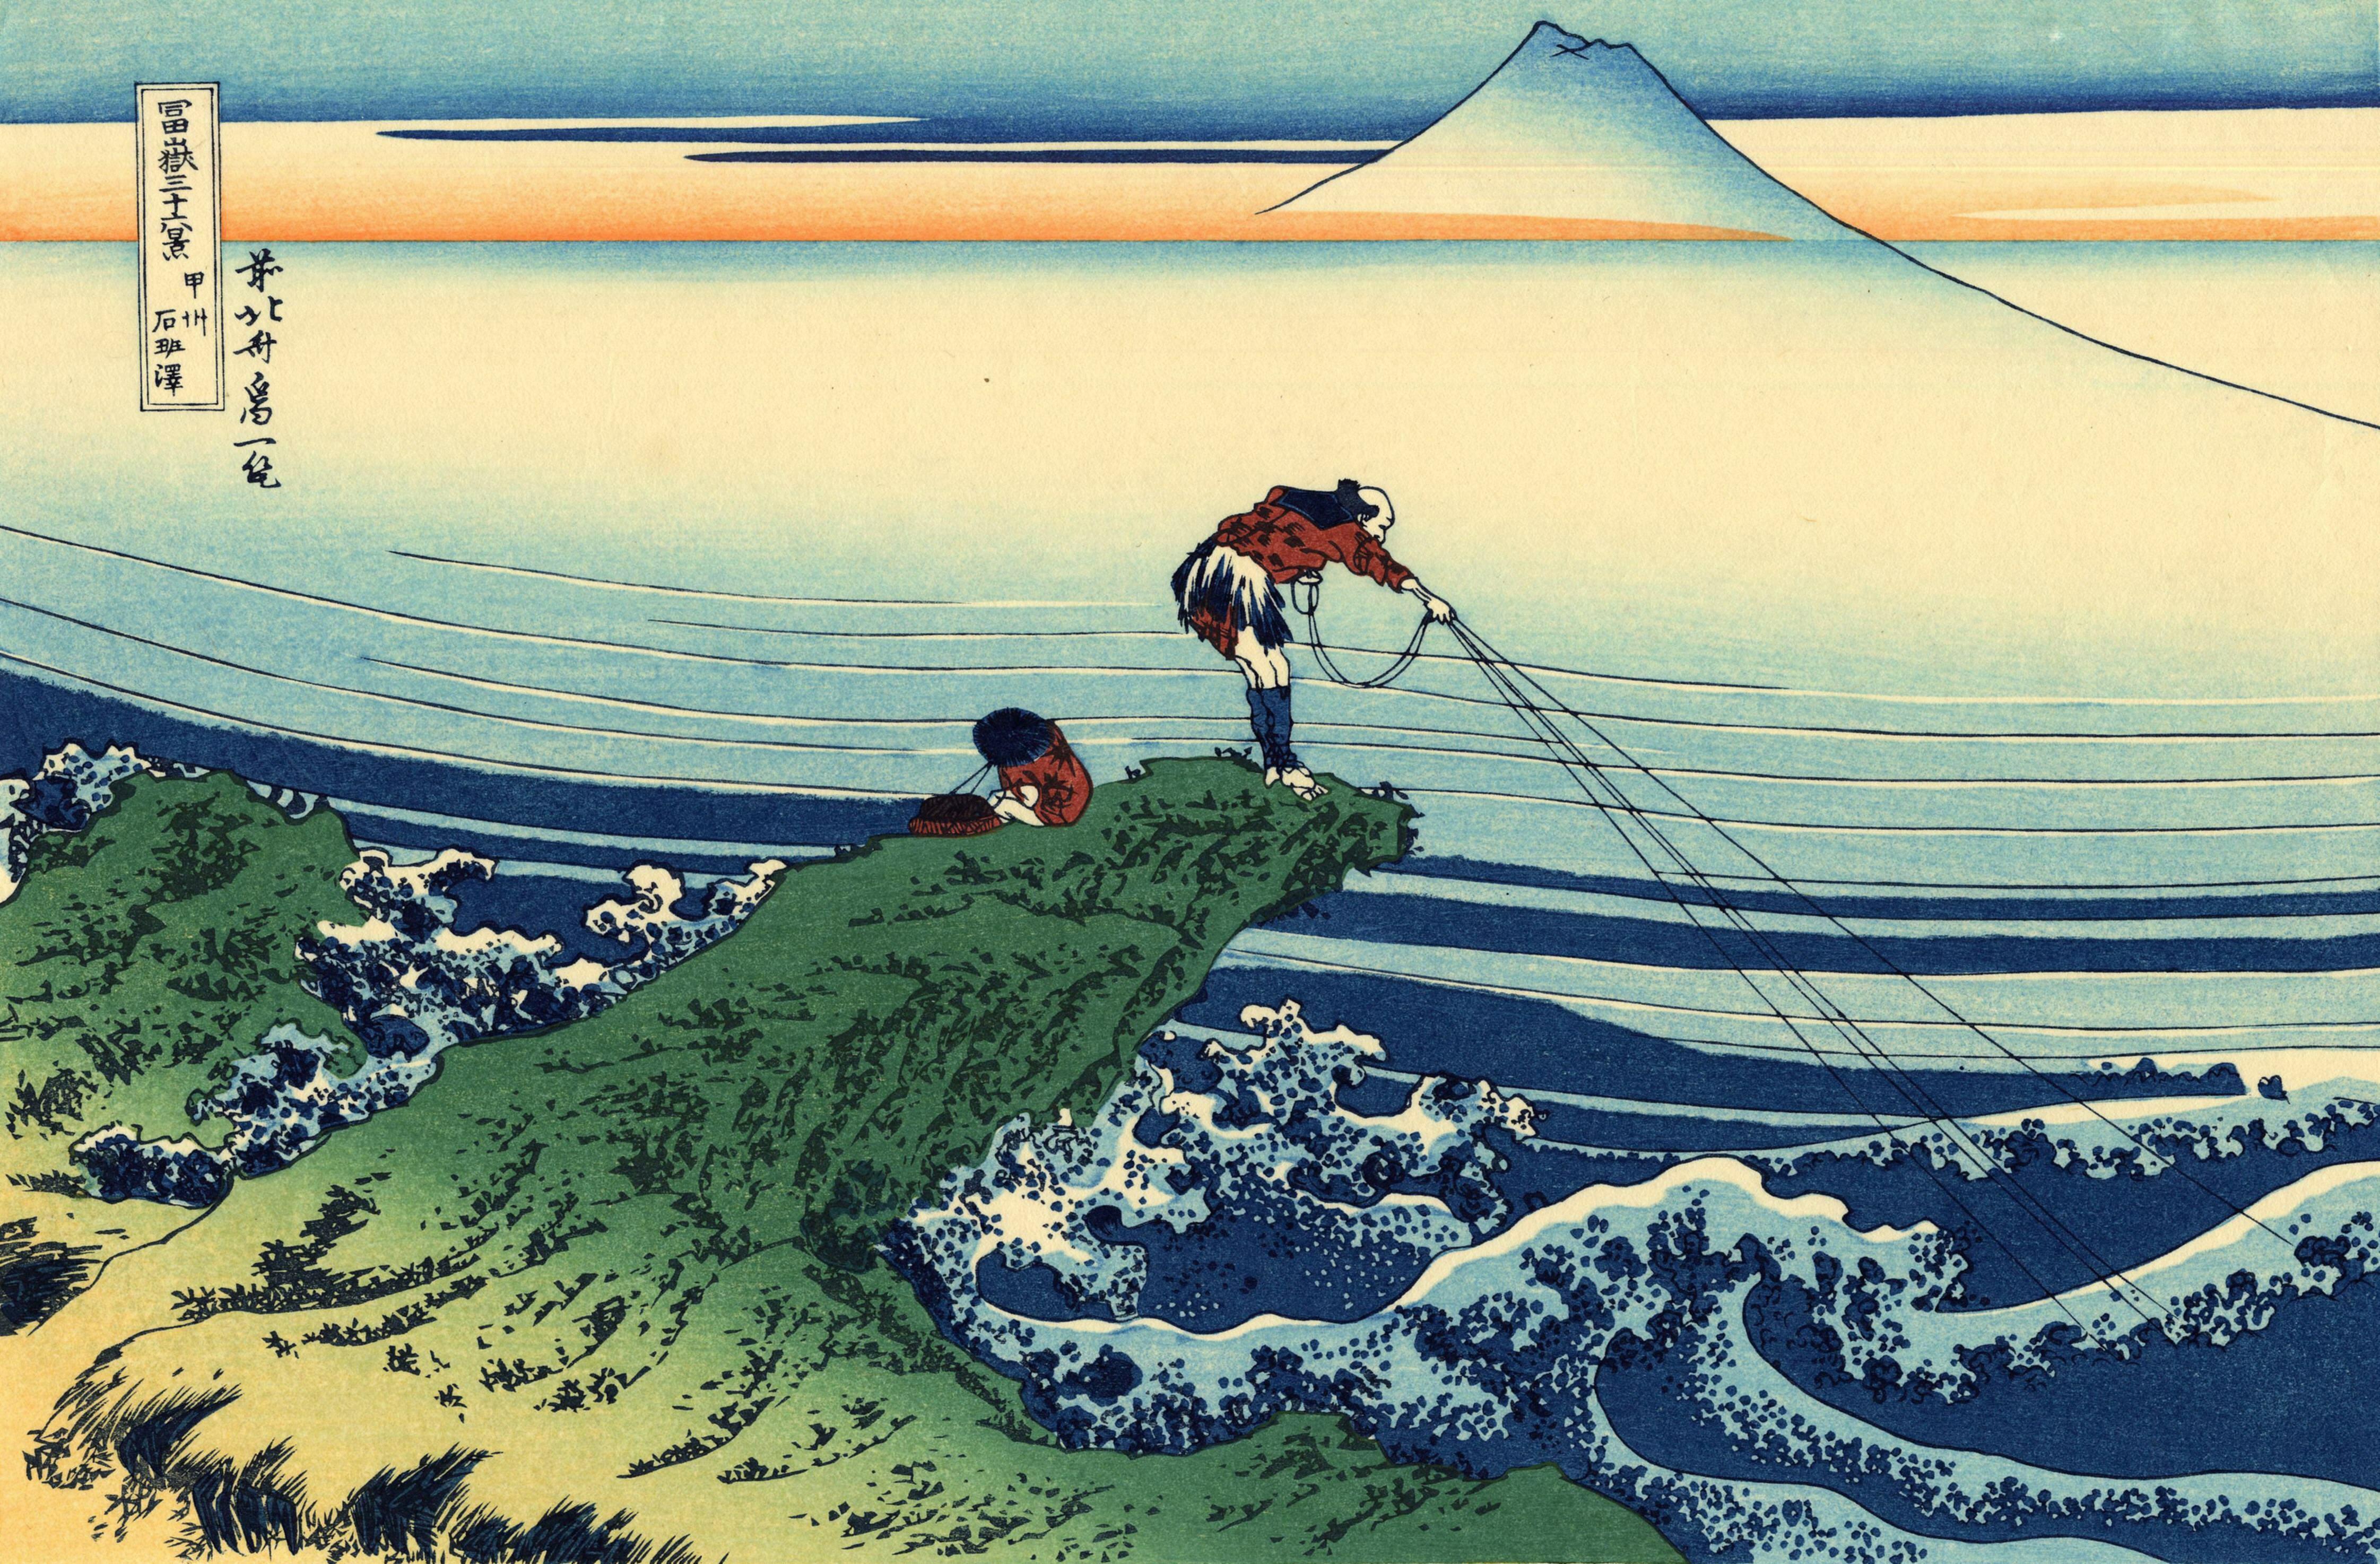 Desktop Wallpaper Hokusai h682536 Comics HD Images 4486x2948